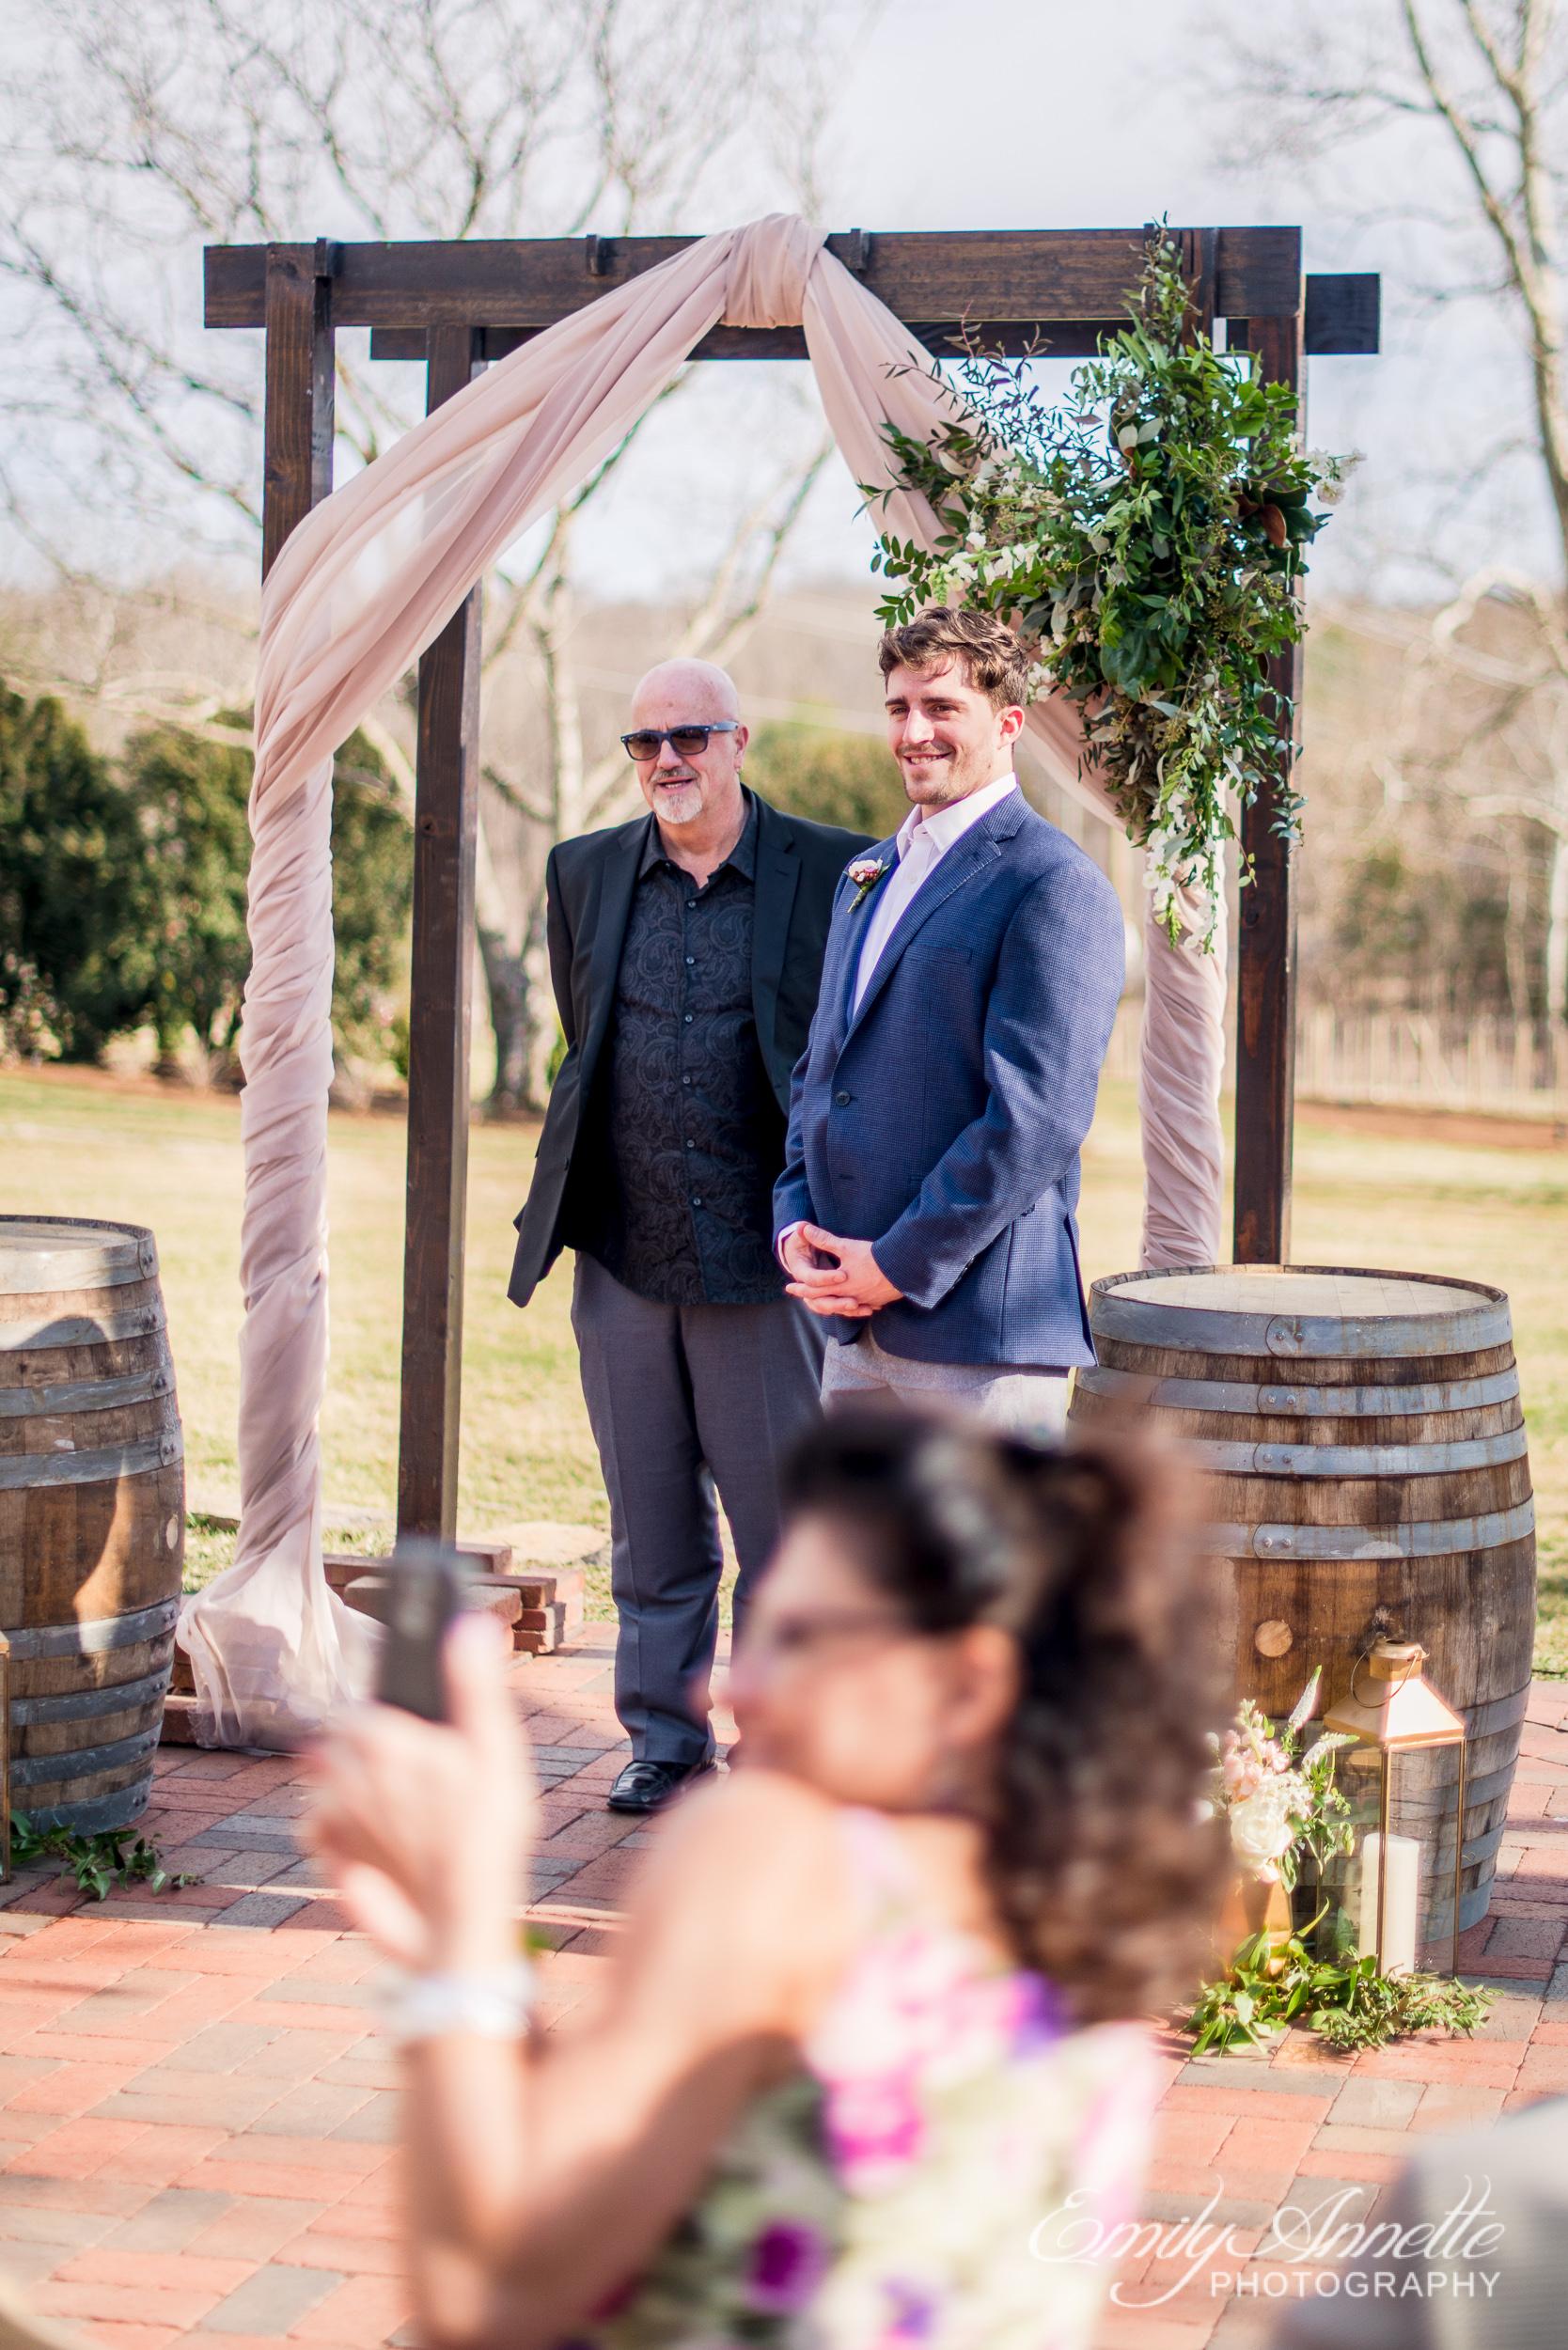 A groom seeing his bride walk down the aisle during their spring wedding at Fleetwood Farm Winery in Leesburg, Virginia